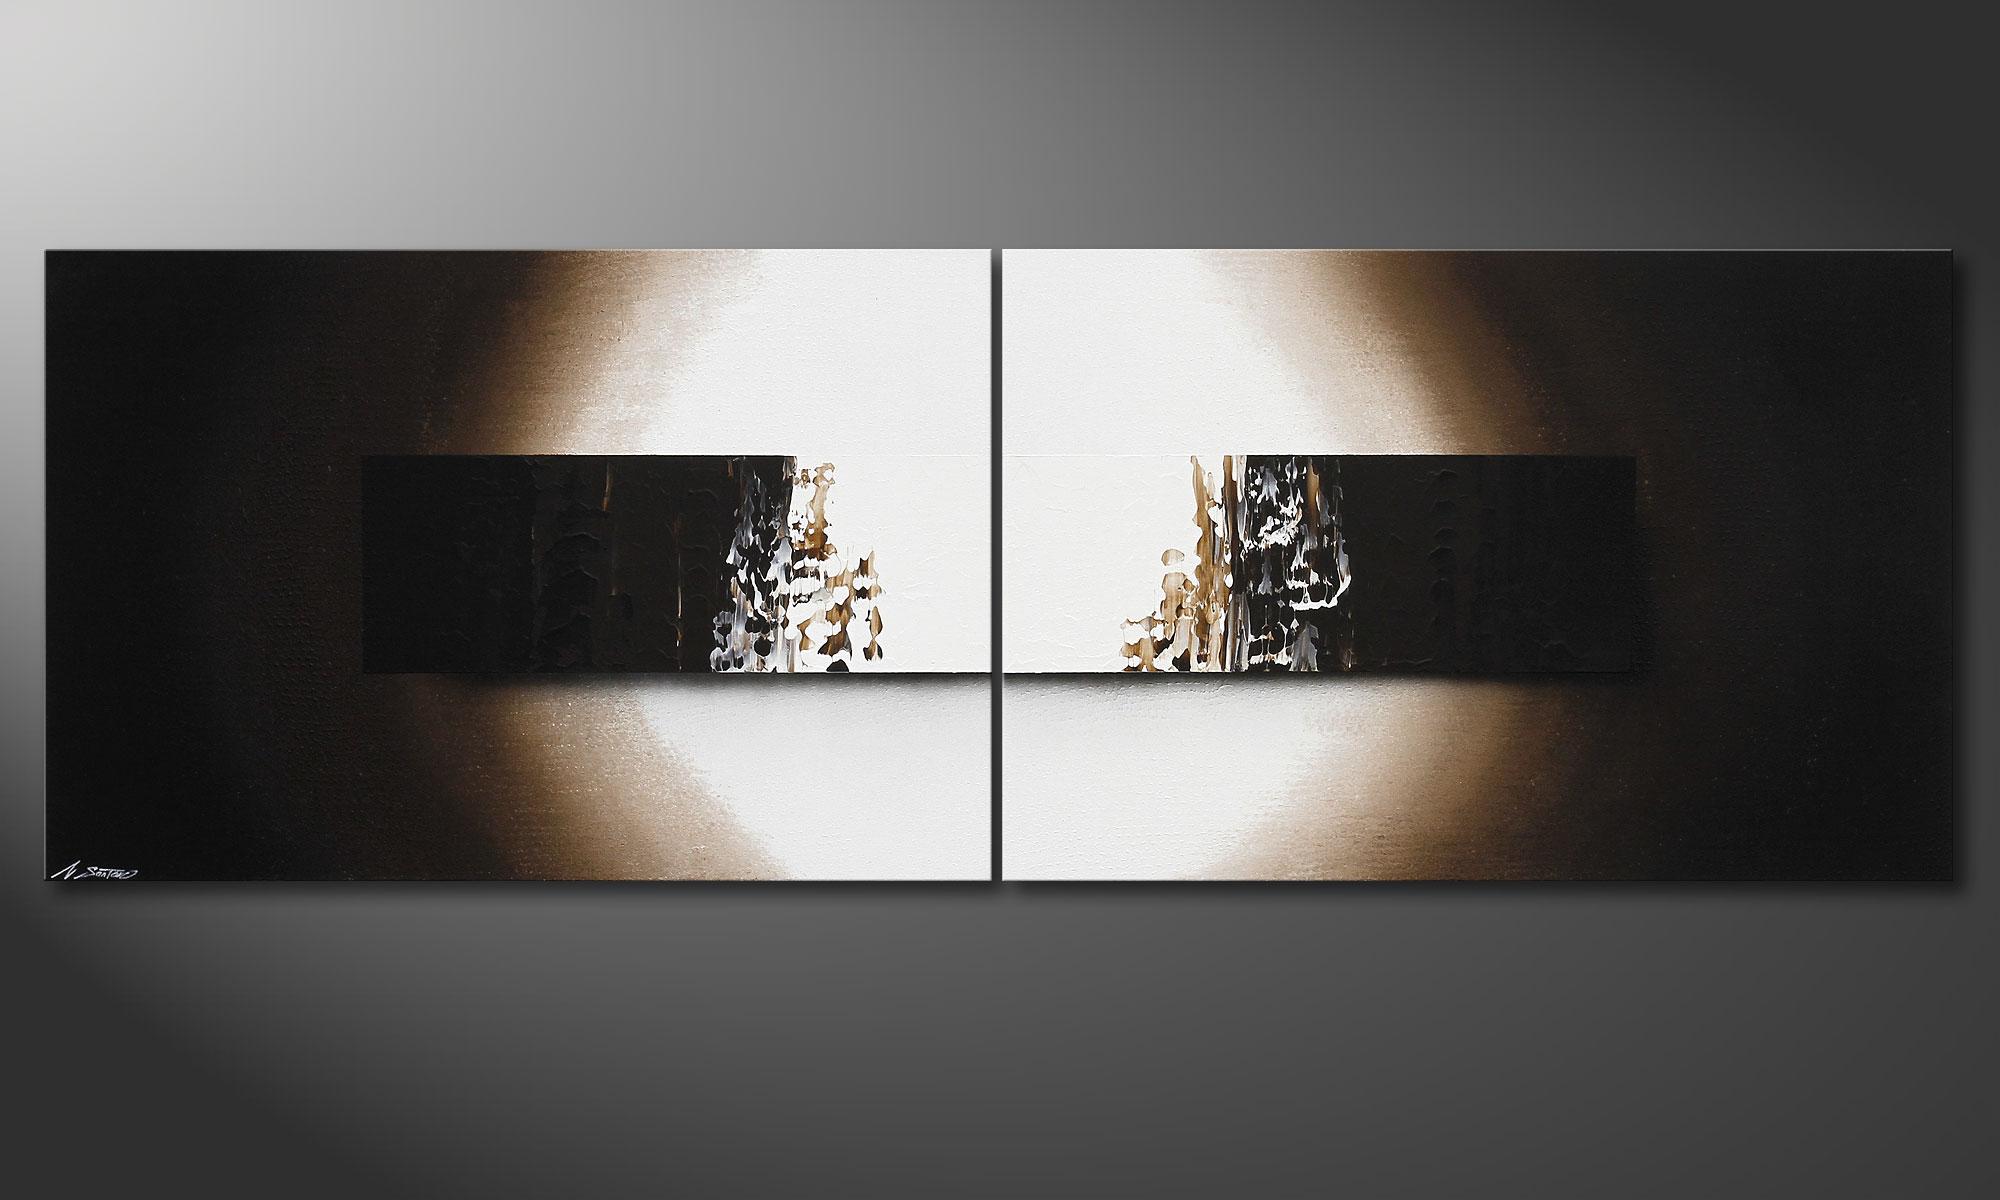 das handgemalte bild light rain 240x80cm wandbilder xxl. Black Bedroom Furniture Sets. Home Design Ideas